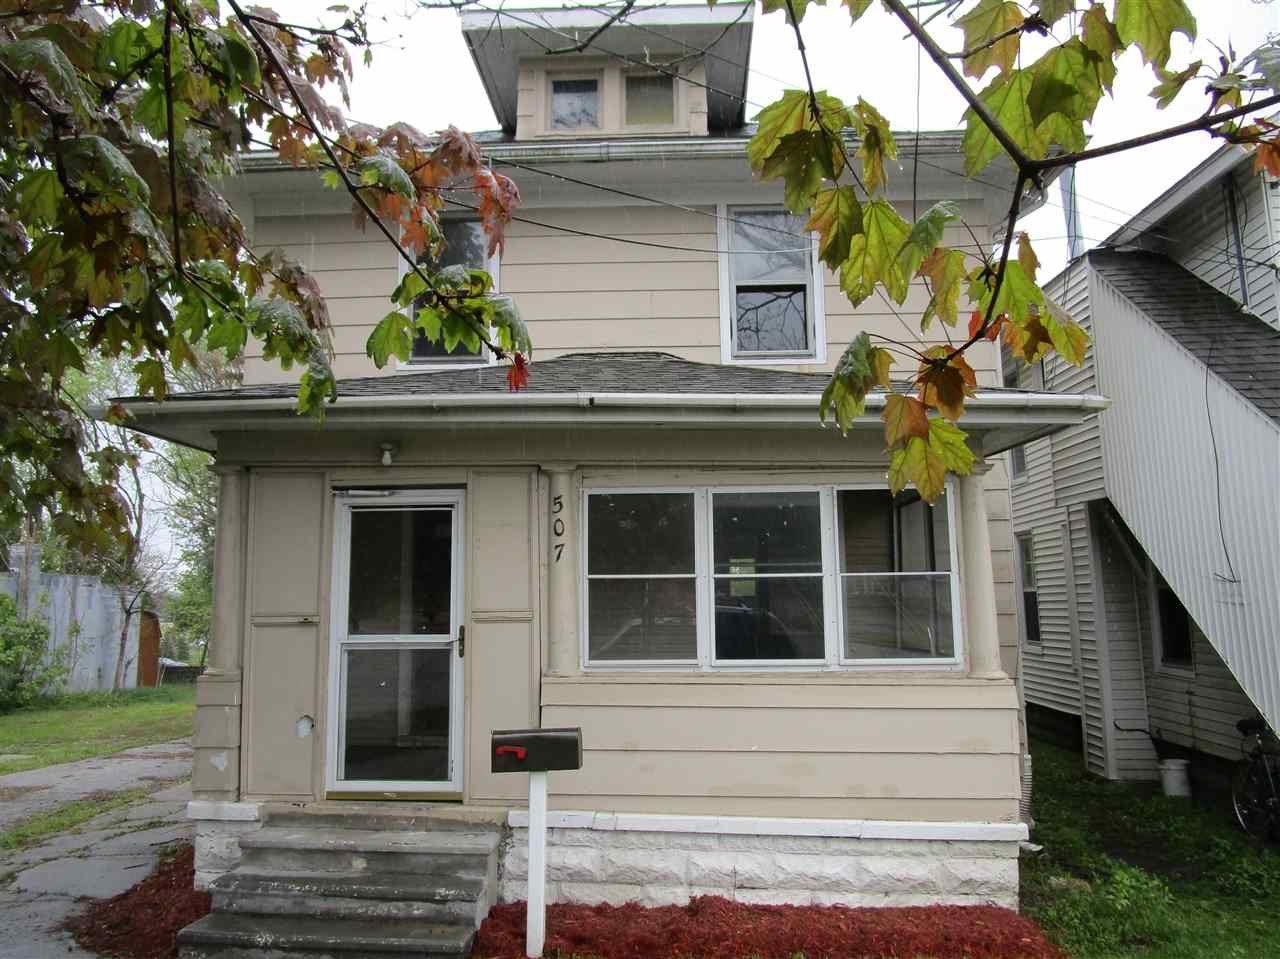 507 N BLACKSTONE, Jackson, MI 49201 - MLS#: 21096050